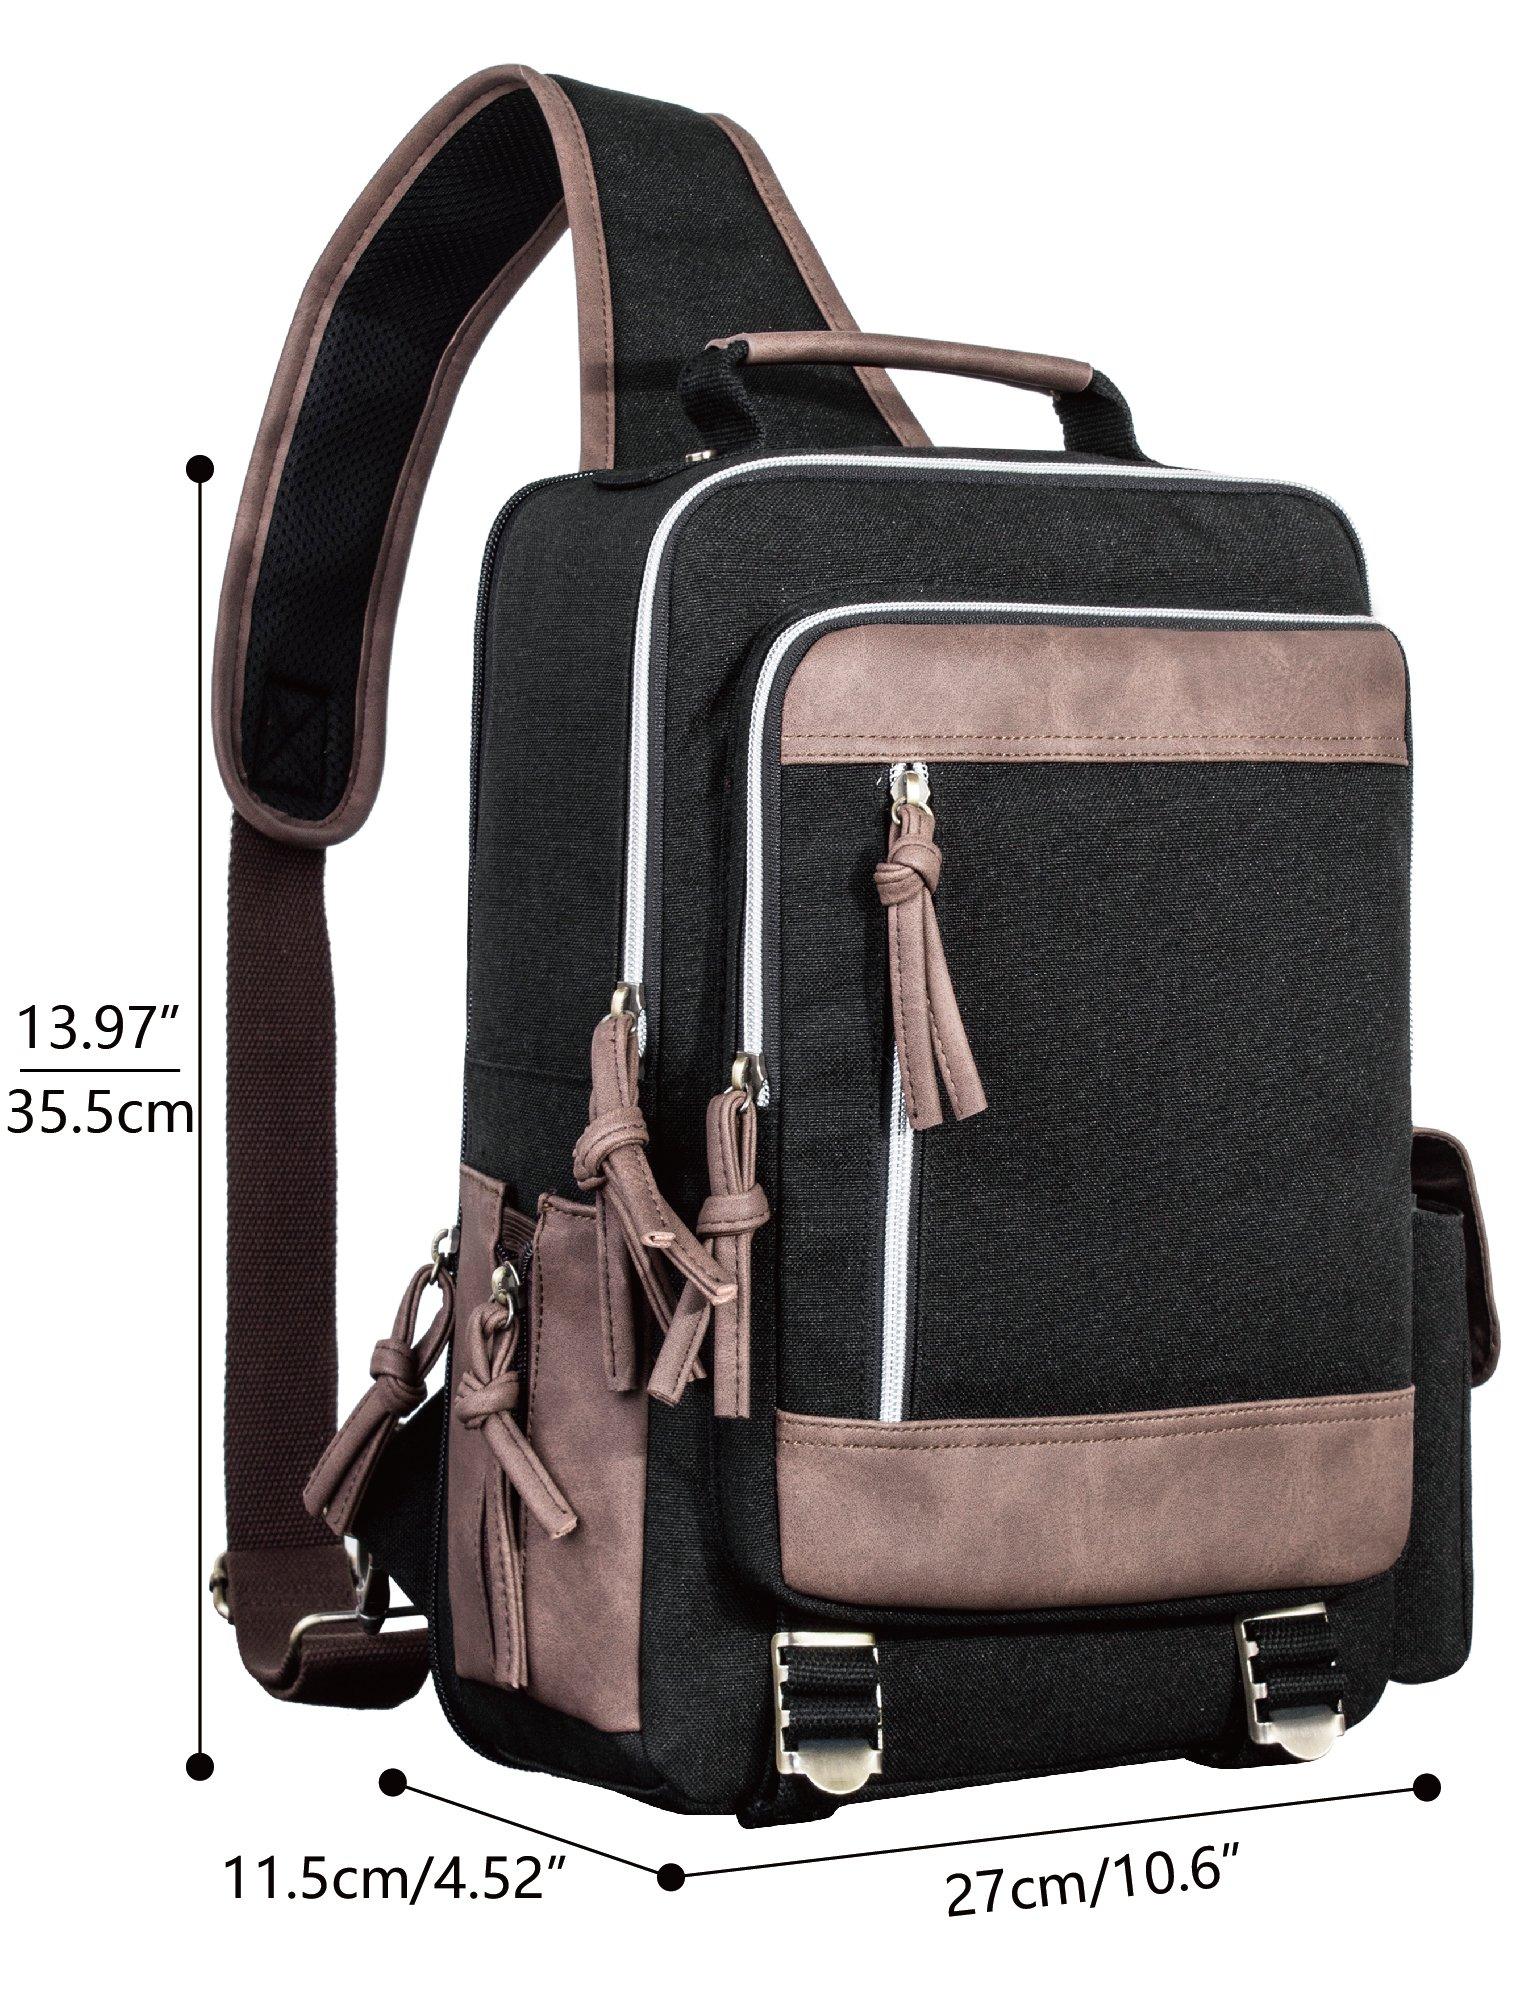 Leaper Retro Messenger Bag Outdoor Cross Body Sling Bag Travel Bag Shoulder Backpack (Black3103) by Leaper (Image #2)